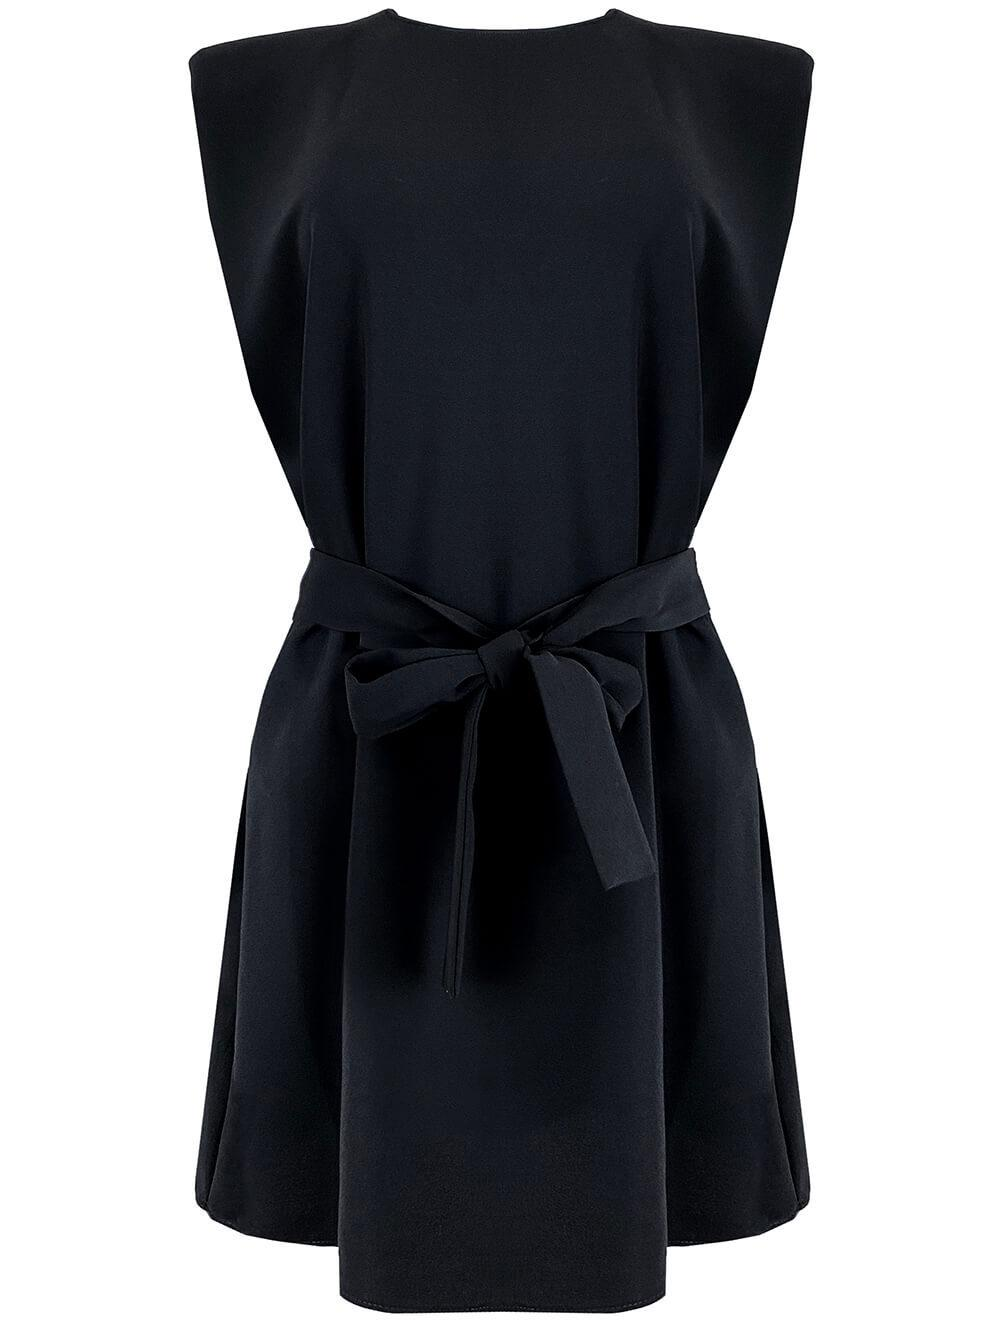 Kenwood Dress Item # CI-21262